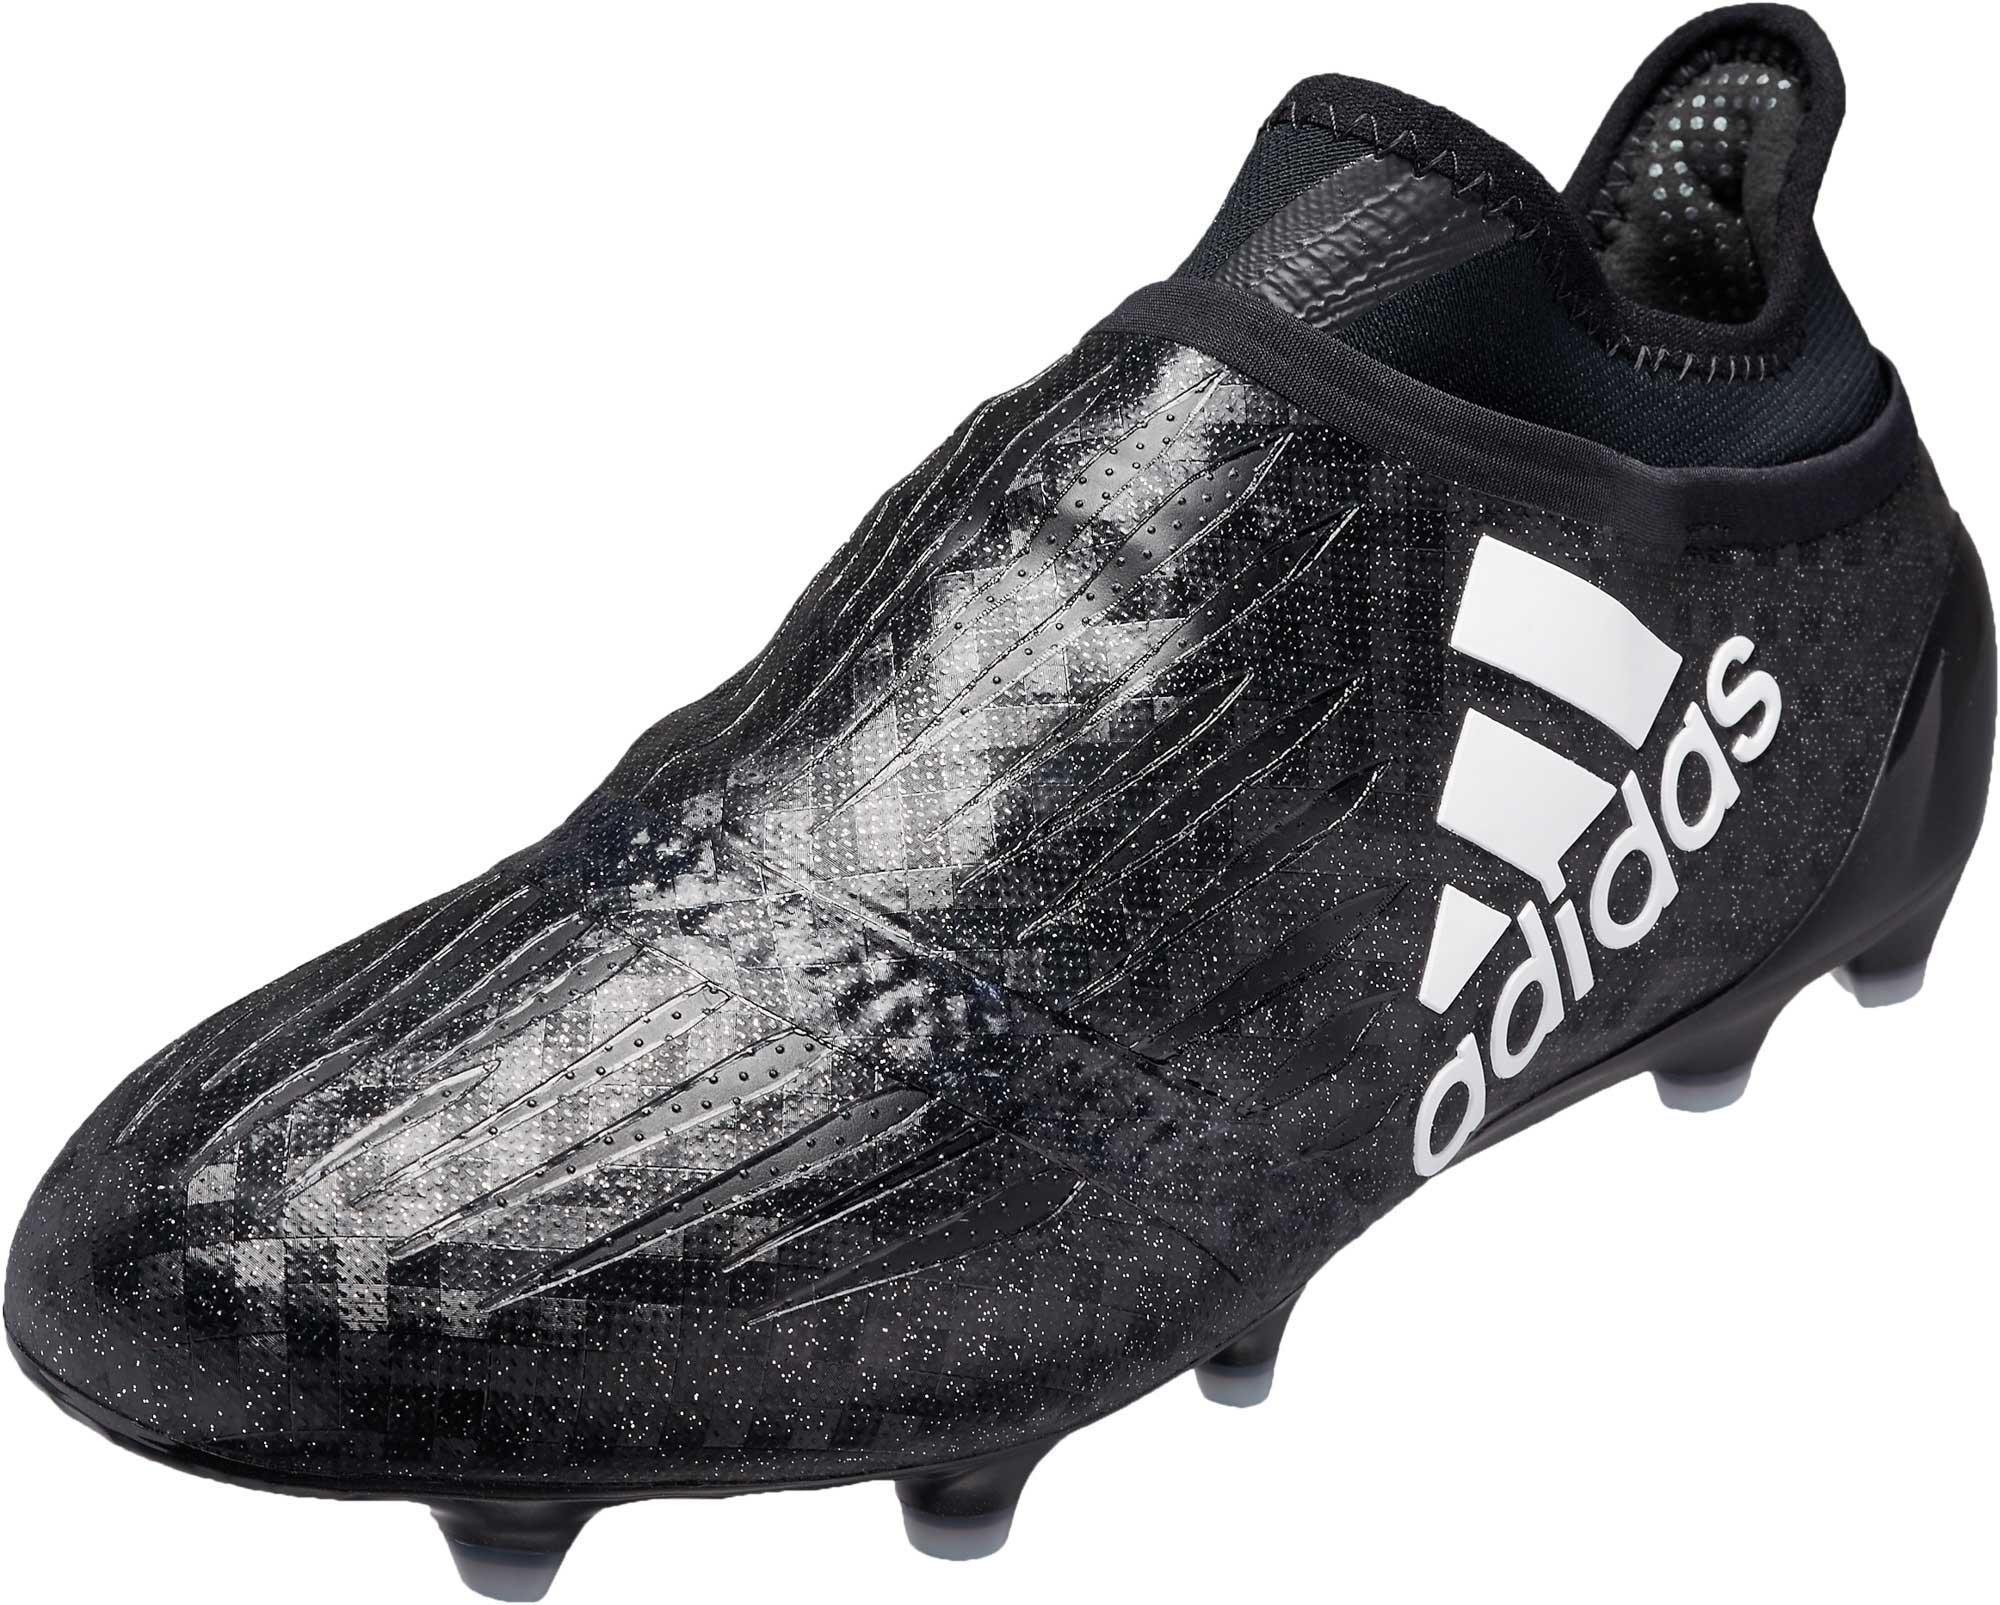 adidas X 16 Purechaos FG Soccer Cleats